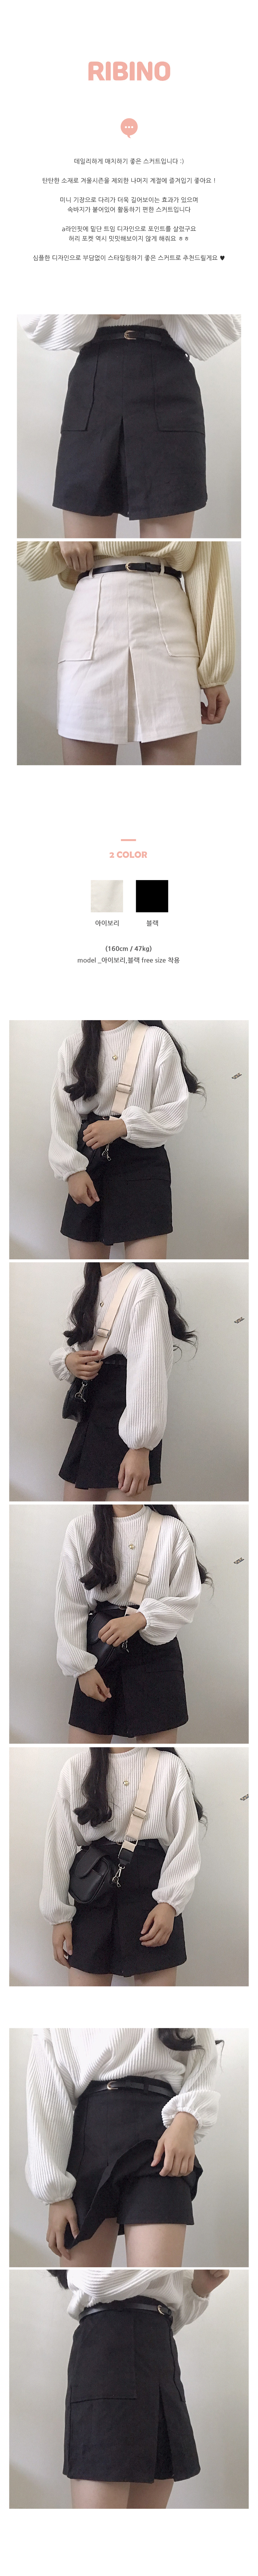 Pocket A-line skirt